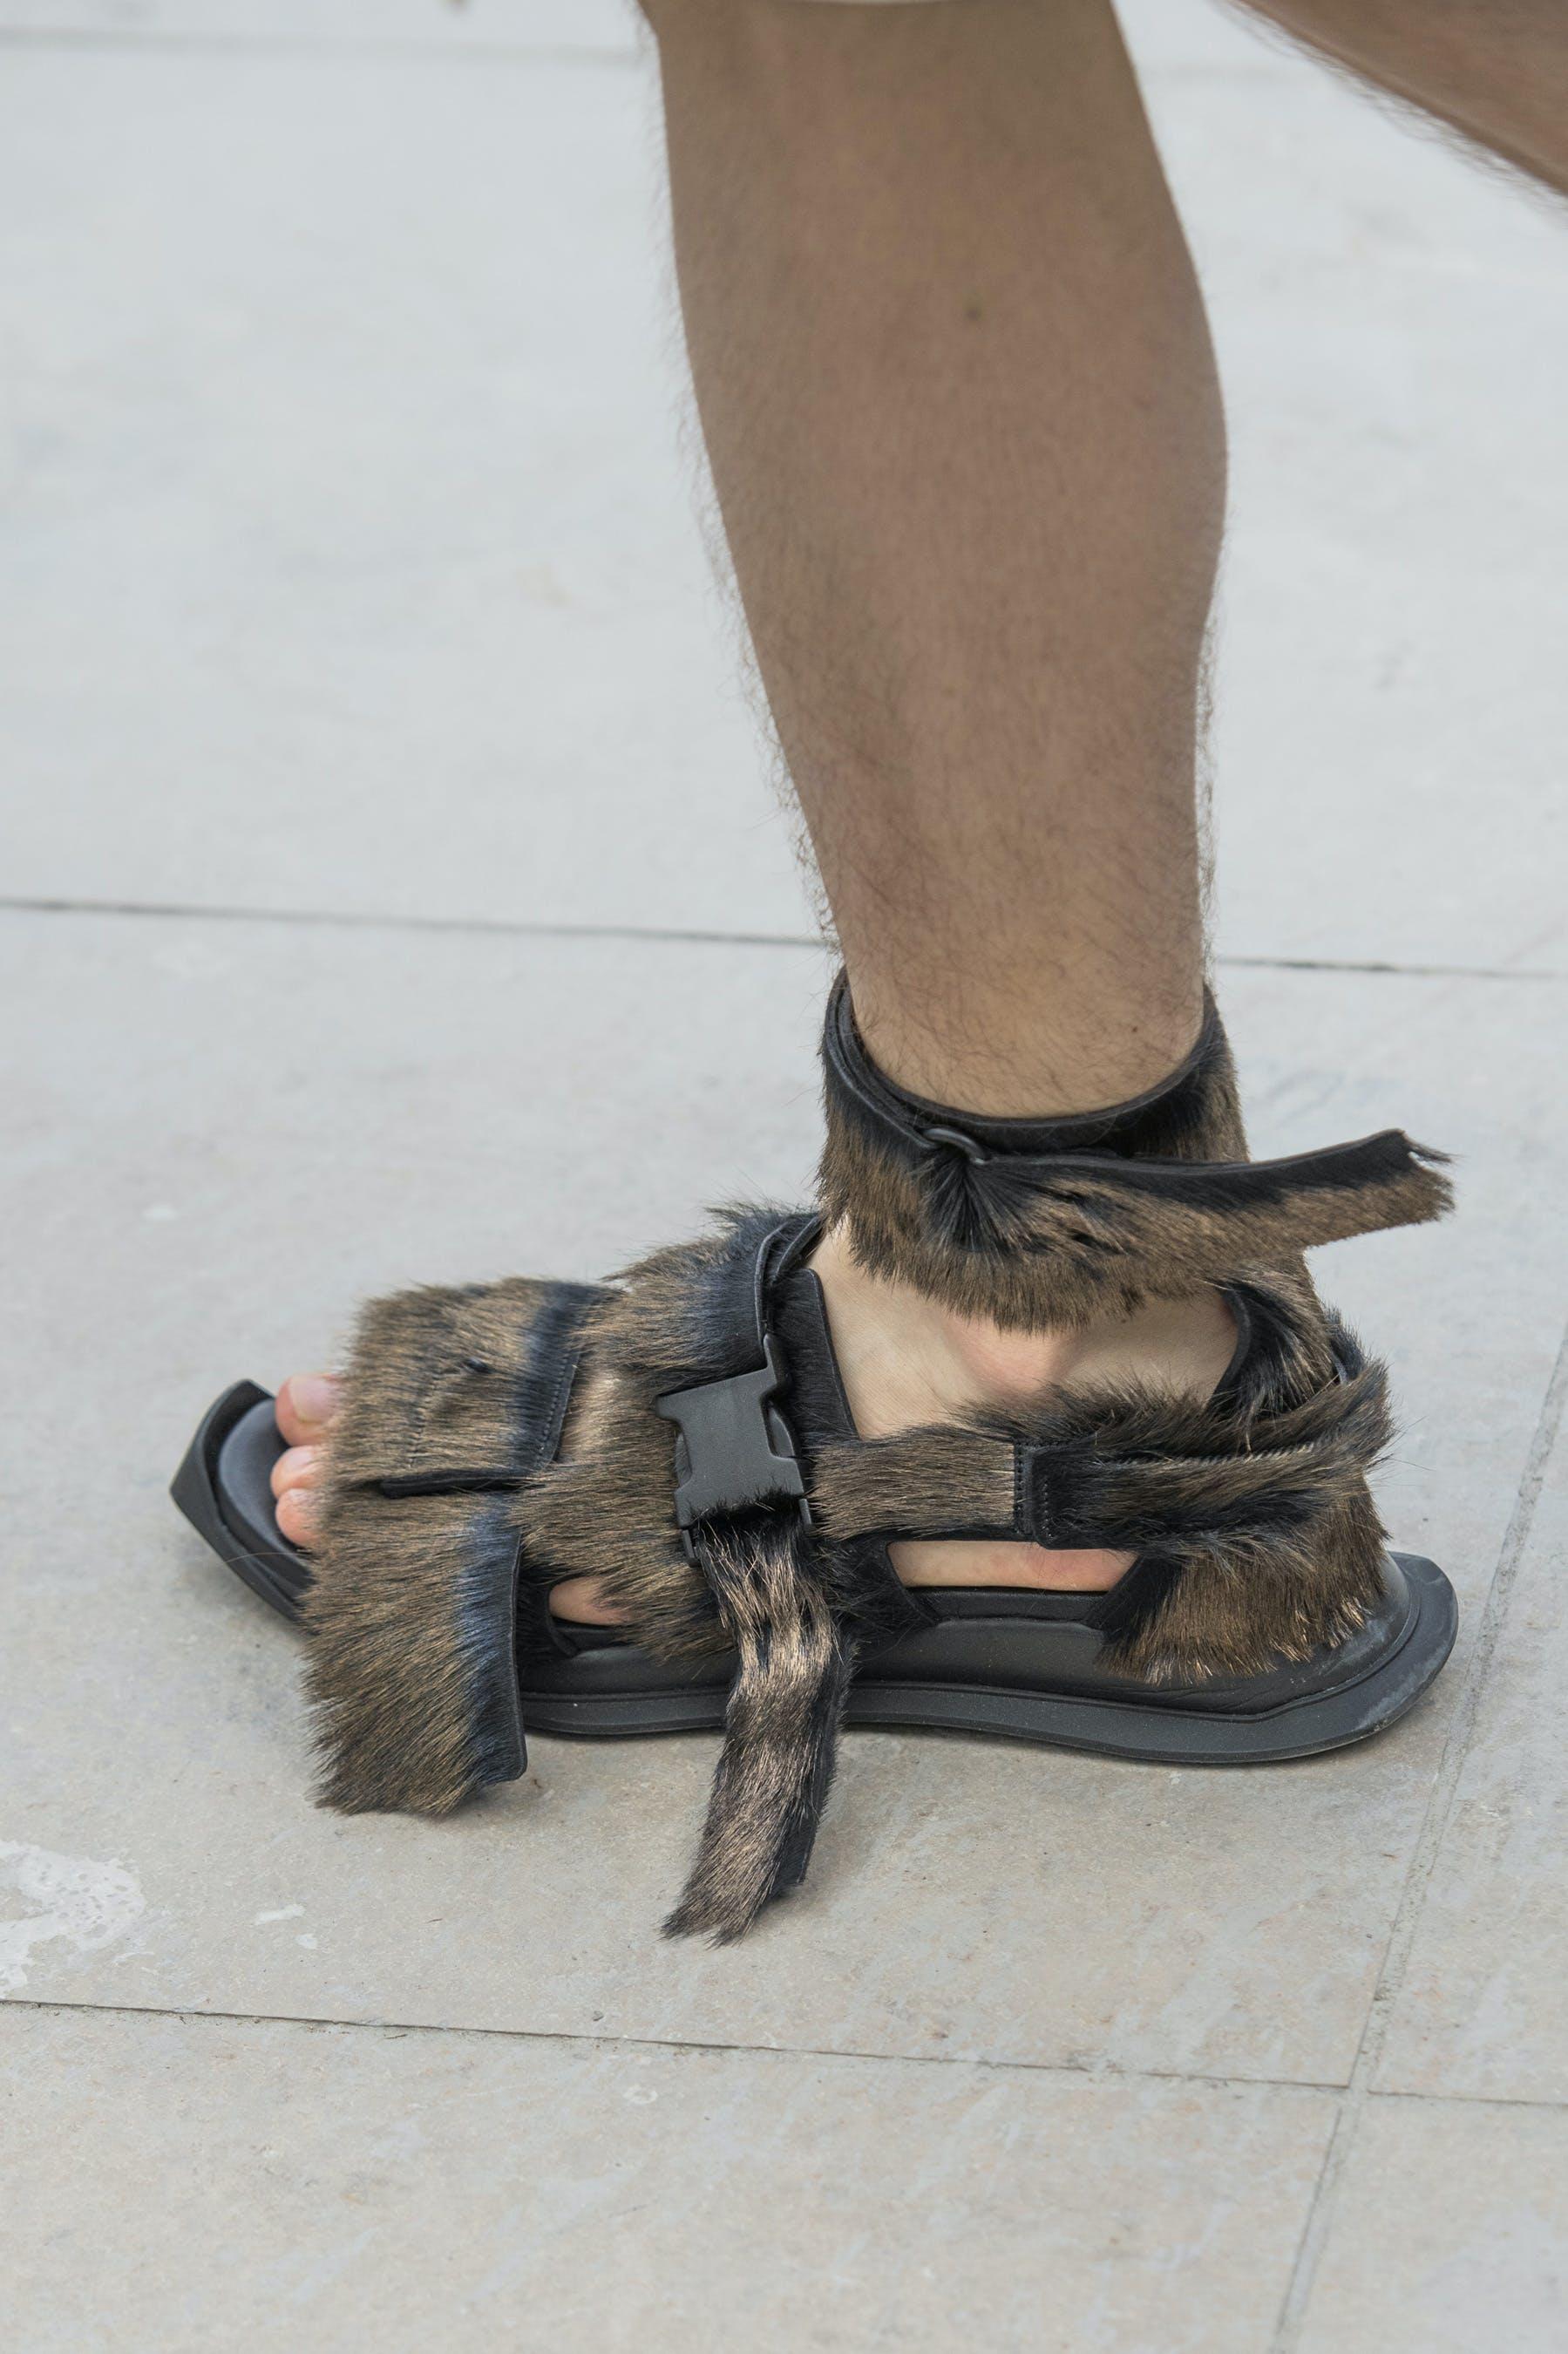 Rick Owens Runway Details Gladi Runner Sandals In Black Leather and Fur Mens SS20 Tecautl